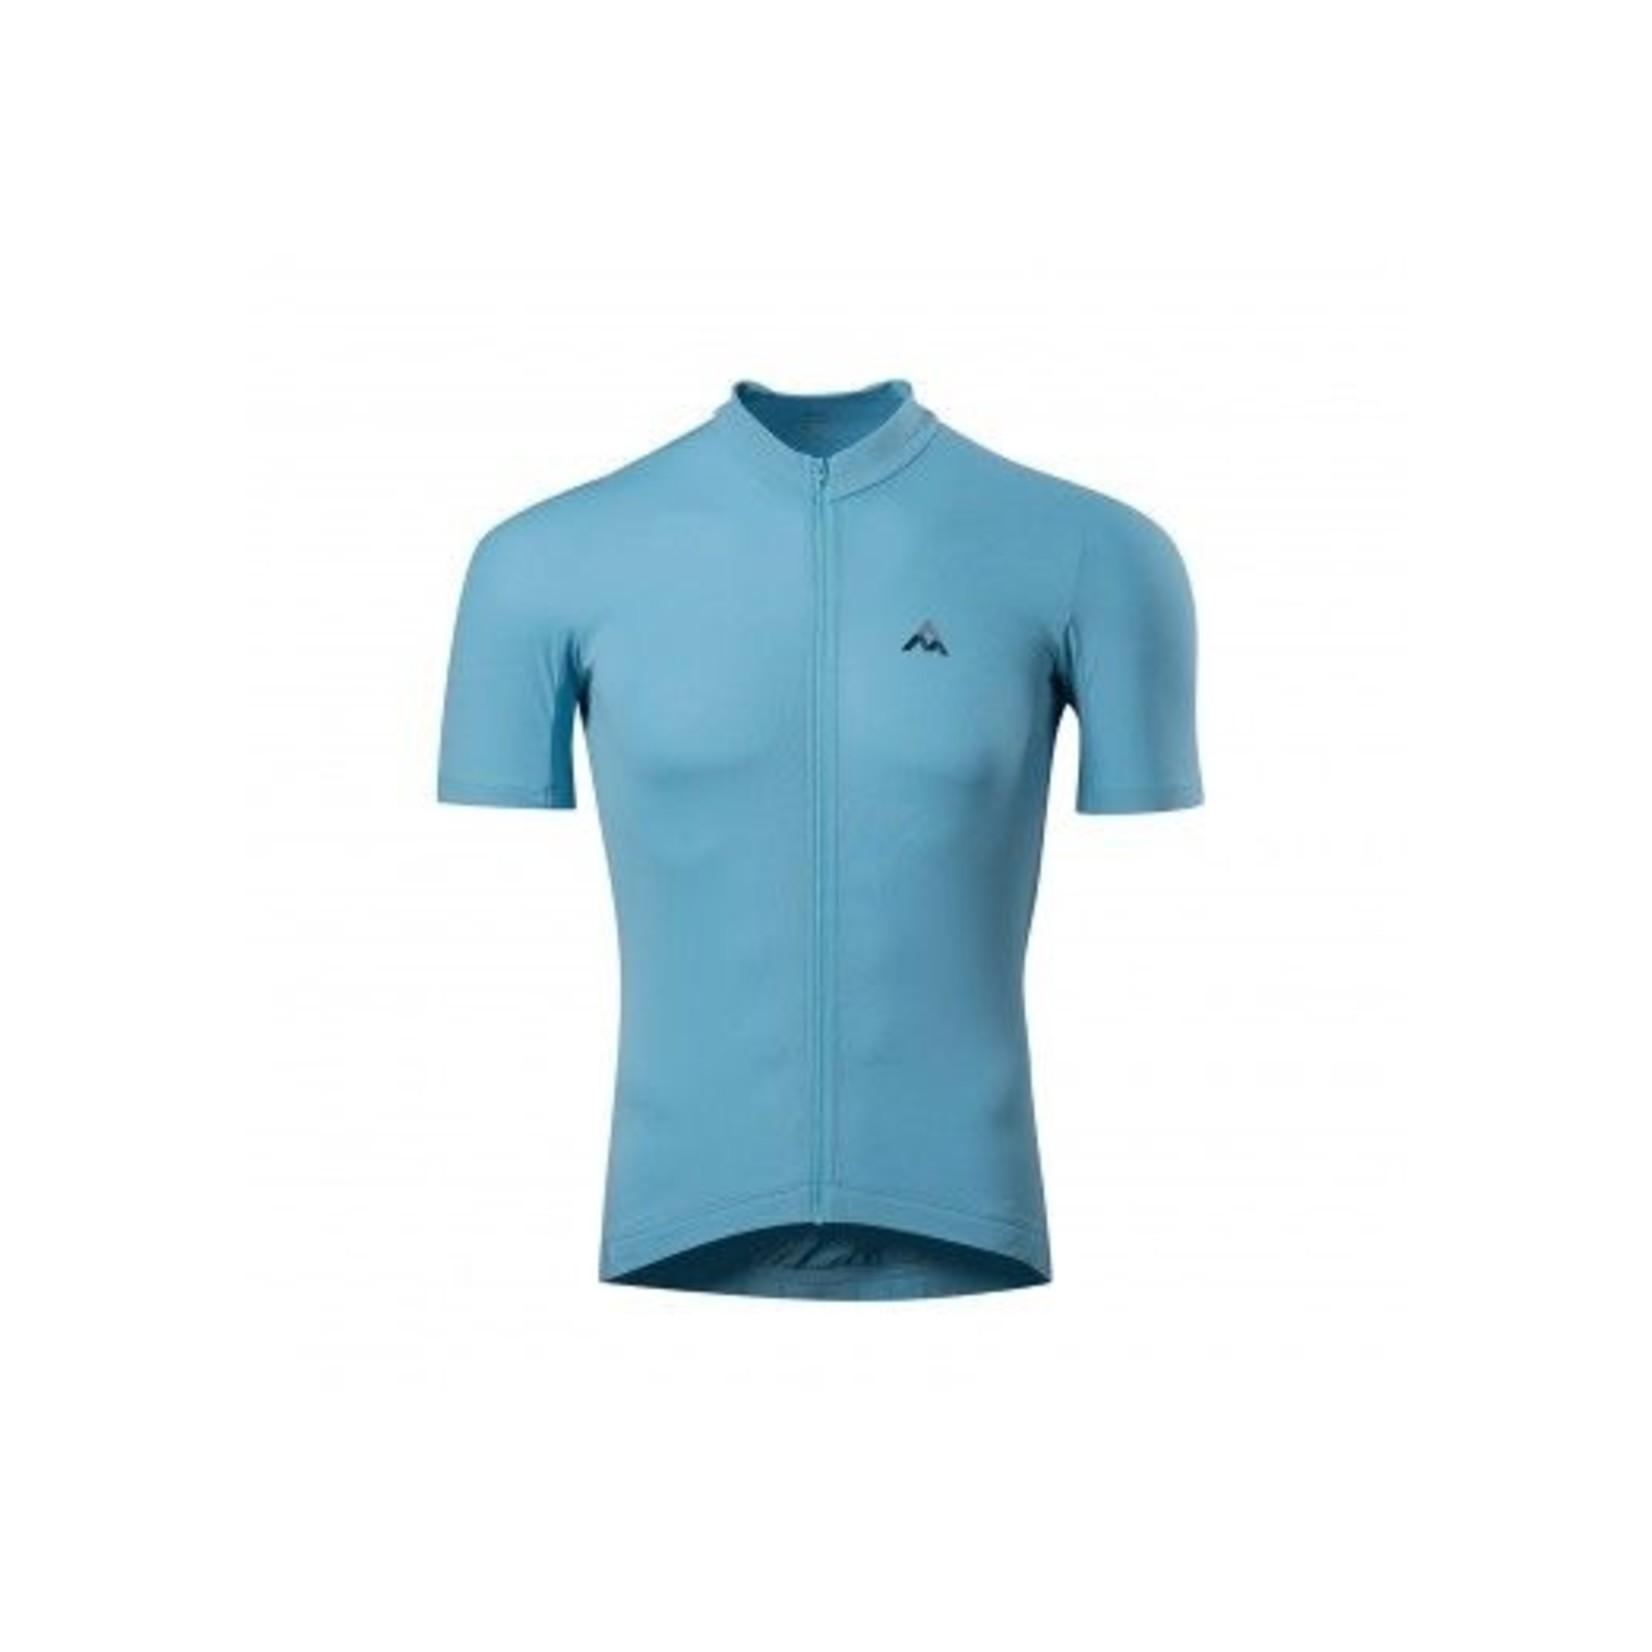 7Mesh 7Mesh Quantum Short Sleeve Jersey Men's